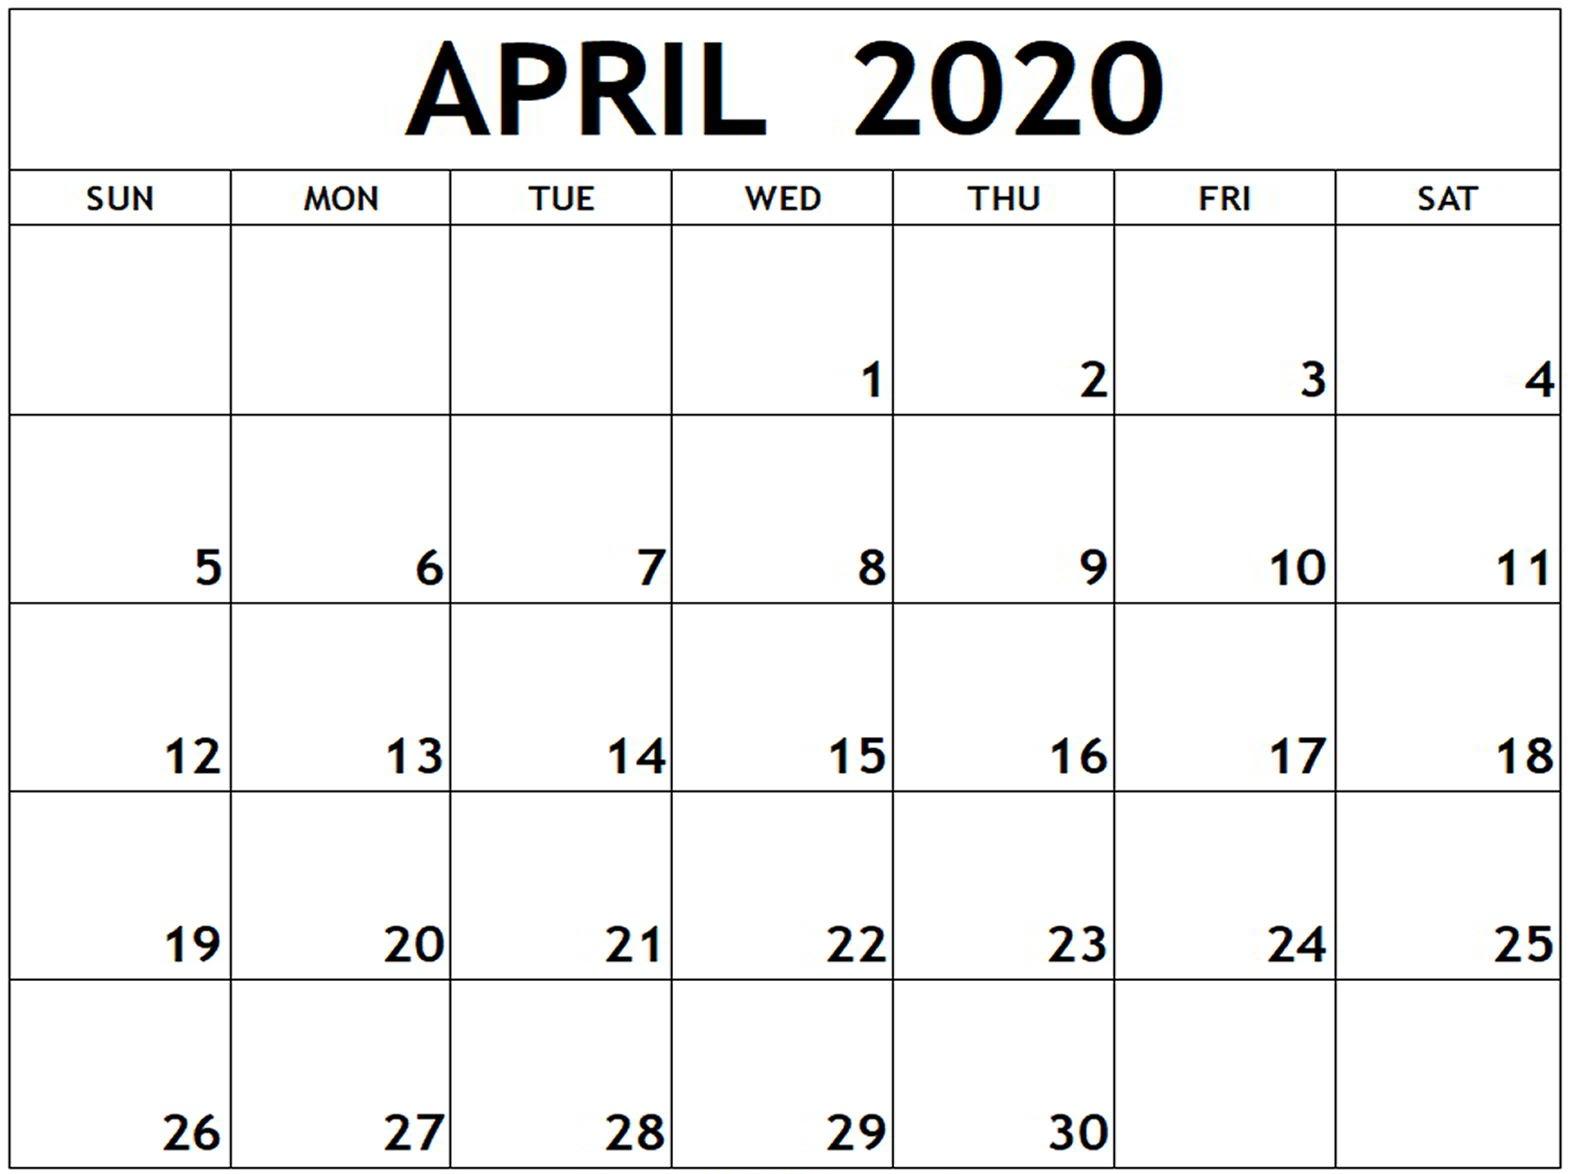 April 2020 Monthly Calendar For Kids